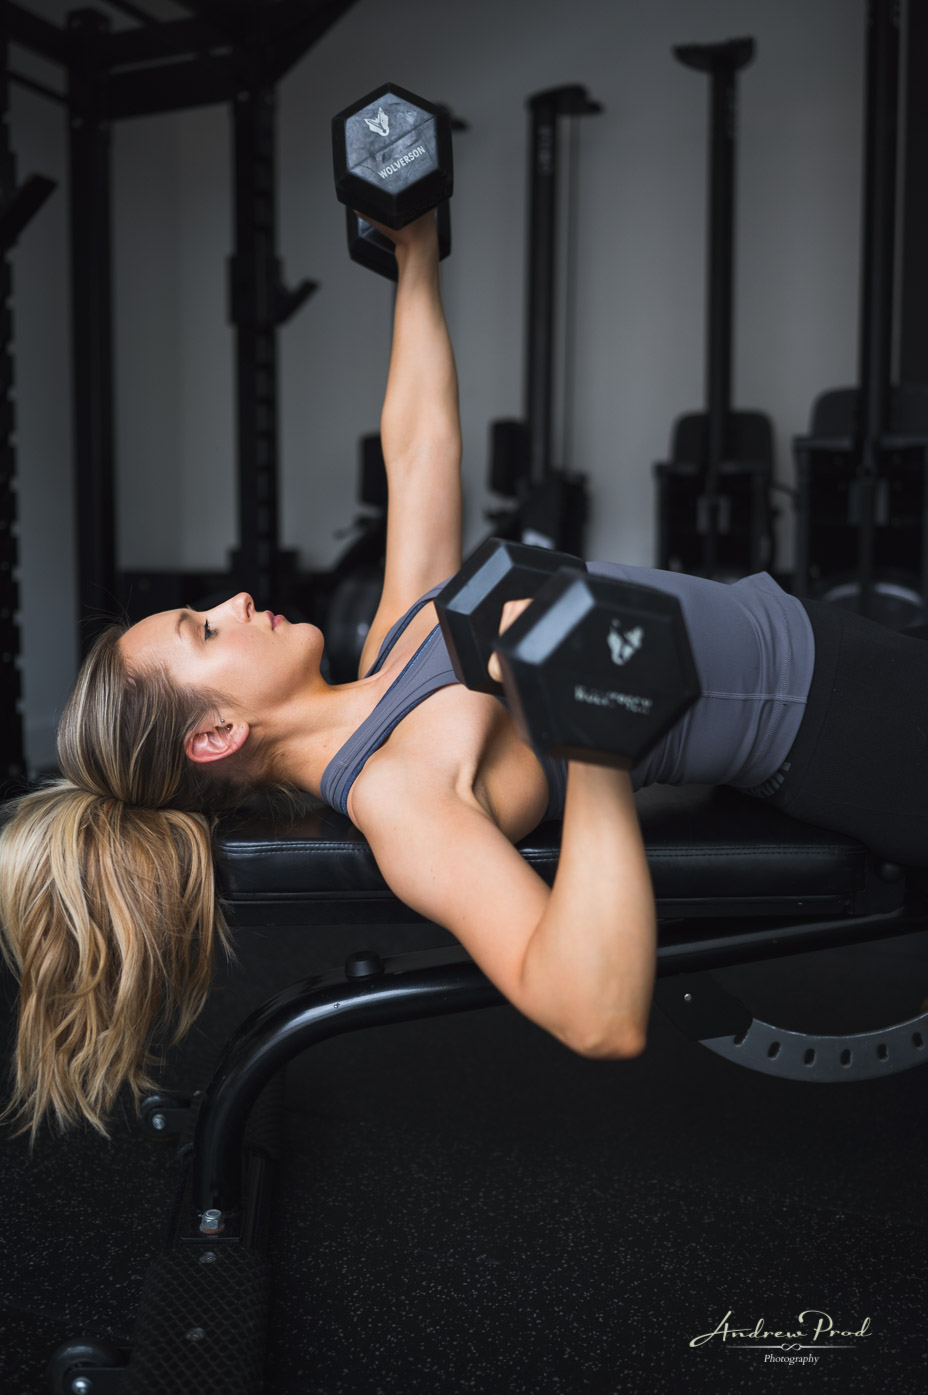 Fitness phootgraphy